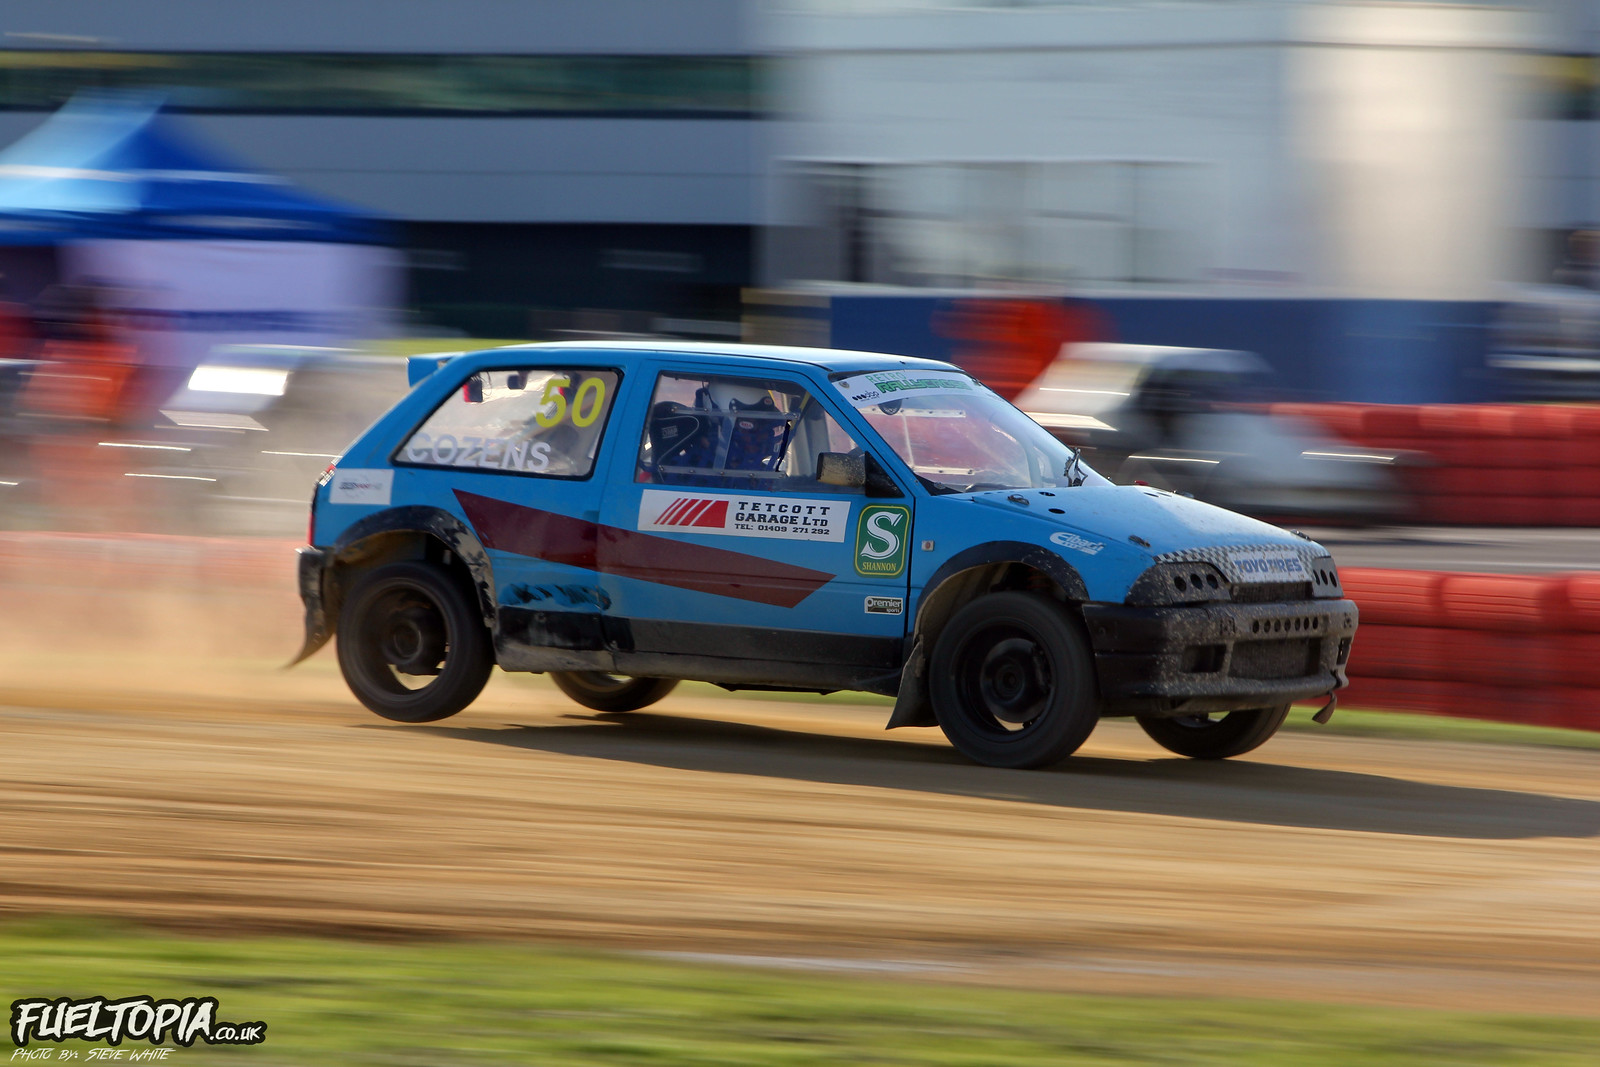 Citroen AX Steve Cozens Retro BRX British Rallycross Championship 2019 Steve White Fueltopia